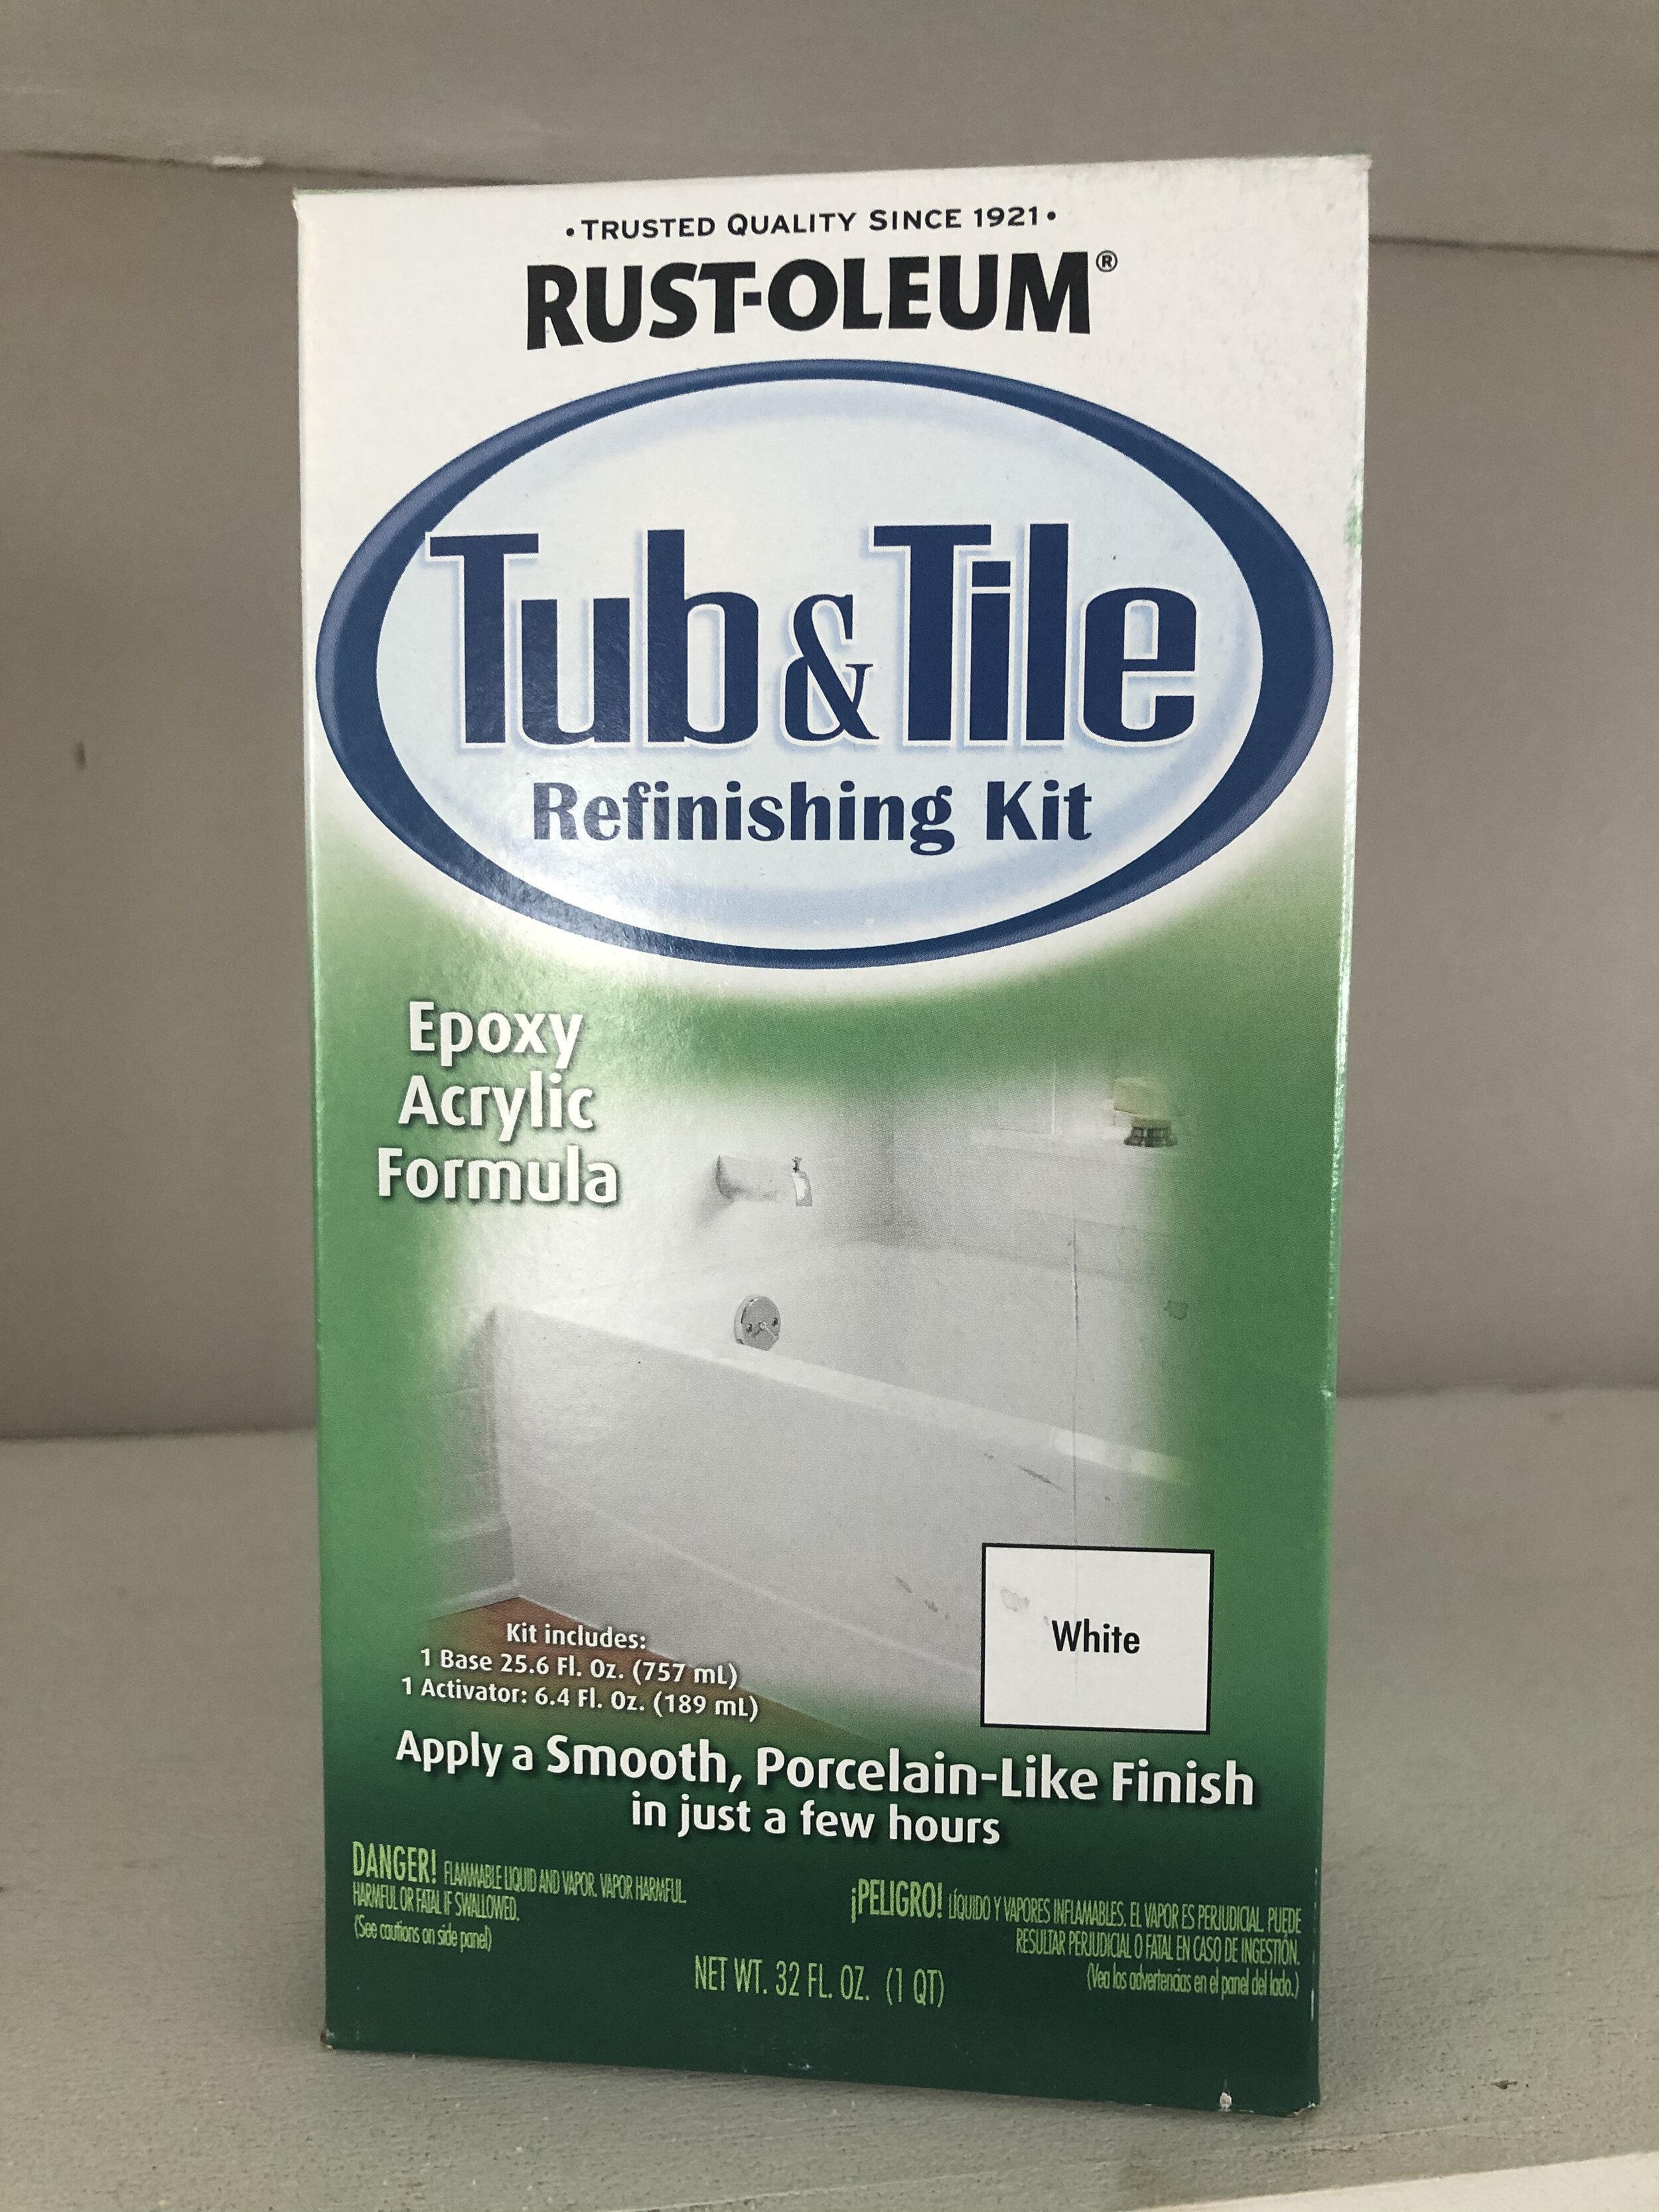 Rust-oleum Tub and Tile Refinishing Kit